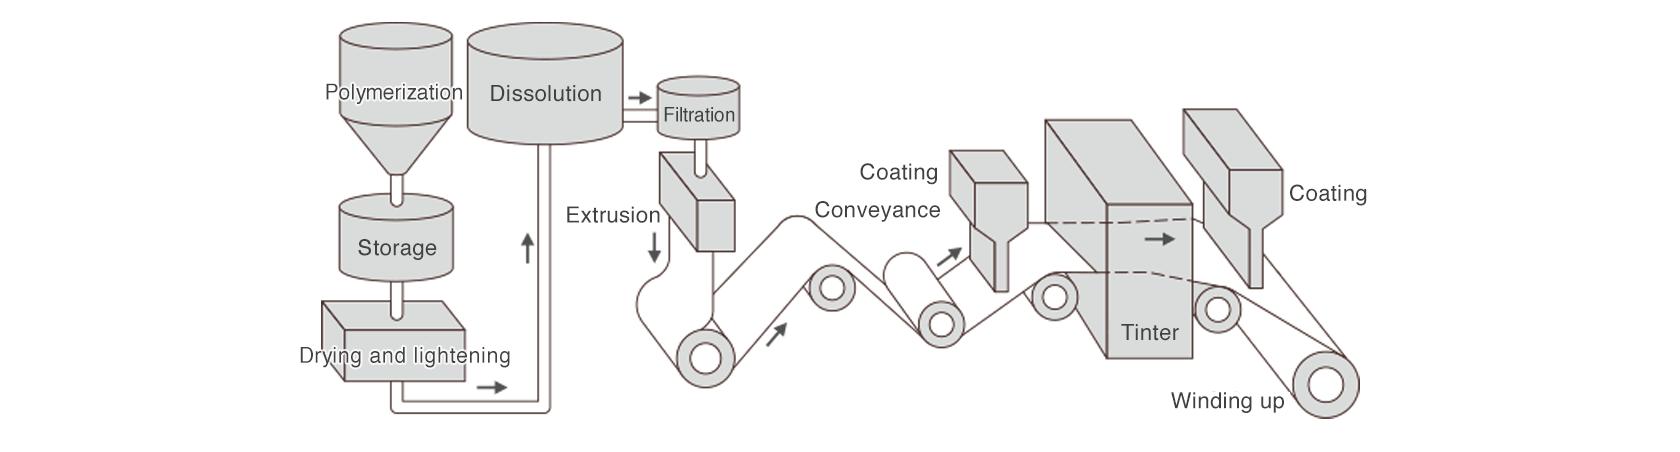 [image] Solvent Membrane Generation Technology